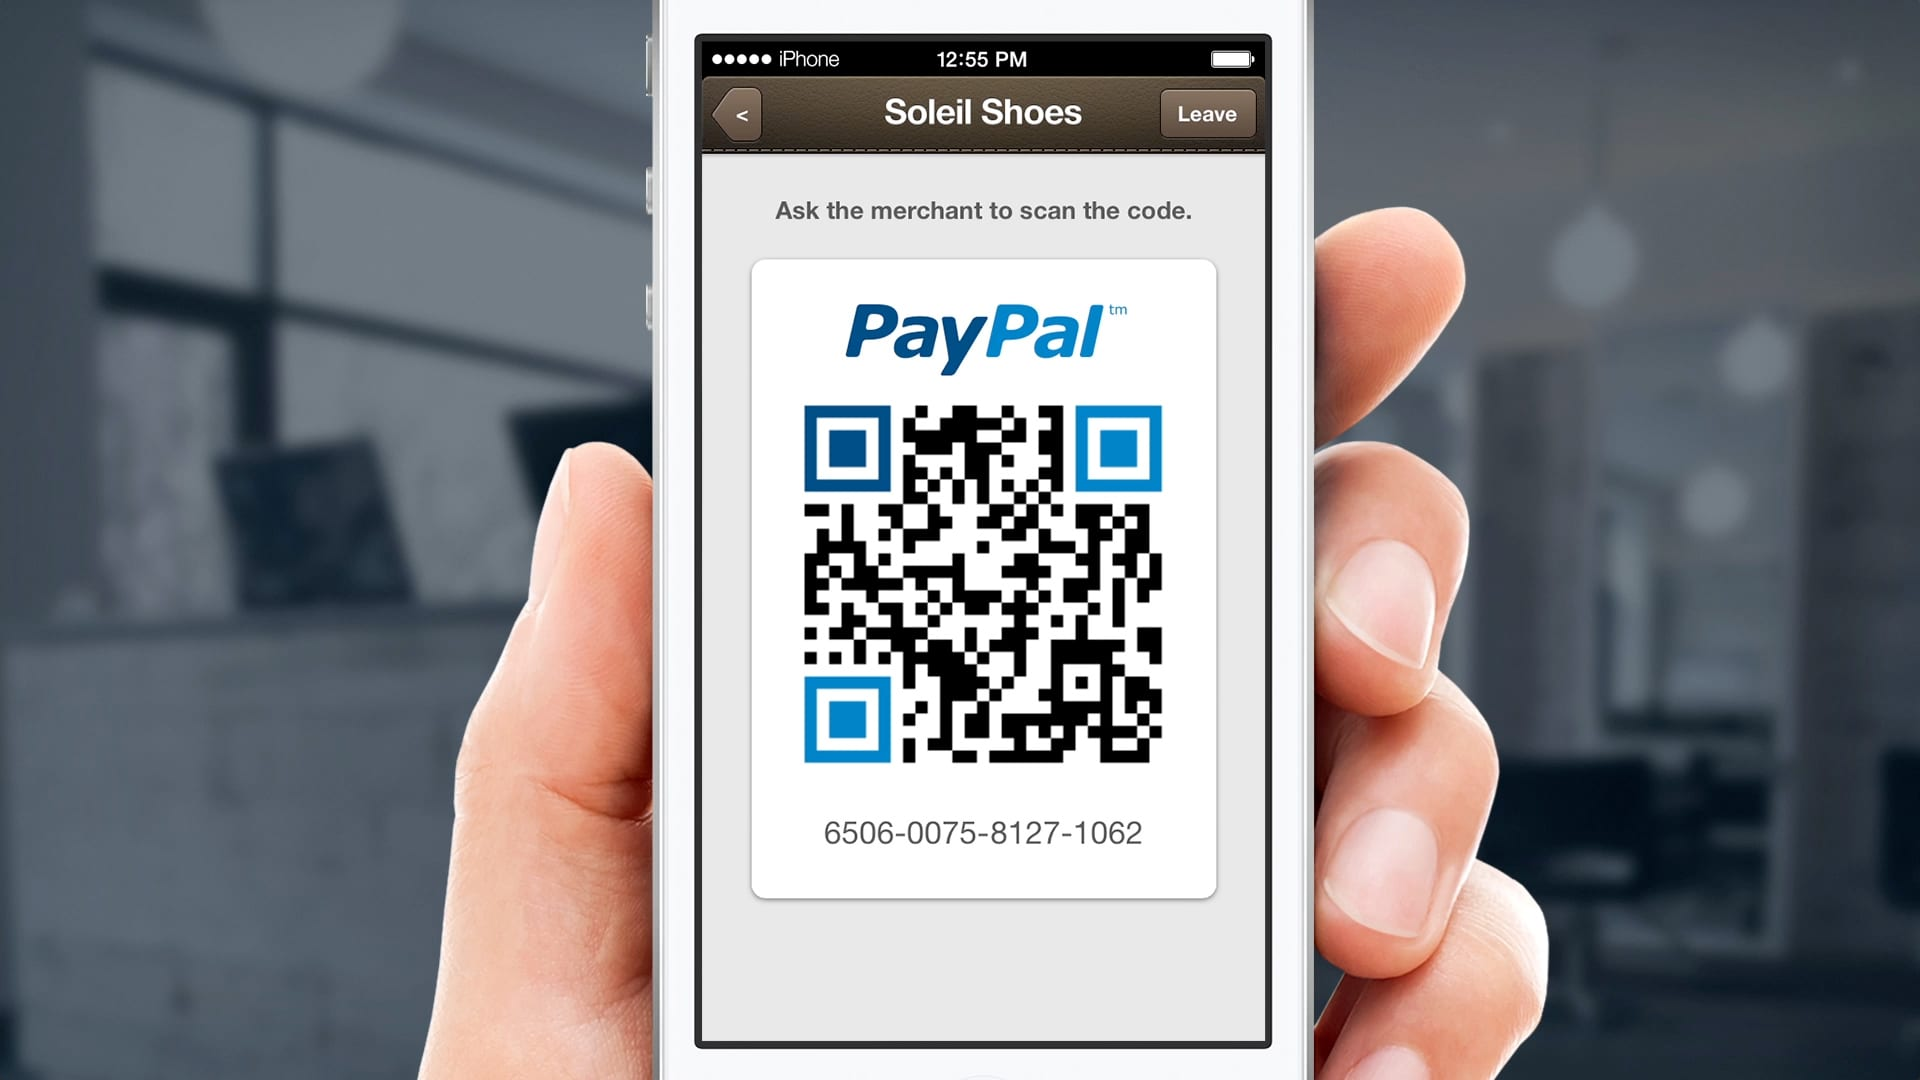 PayPal QR Code